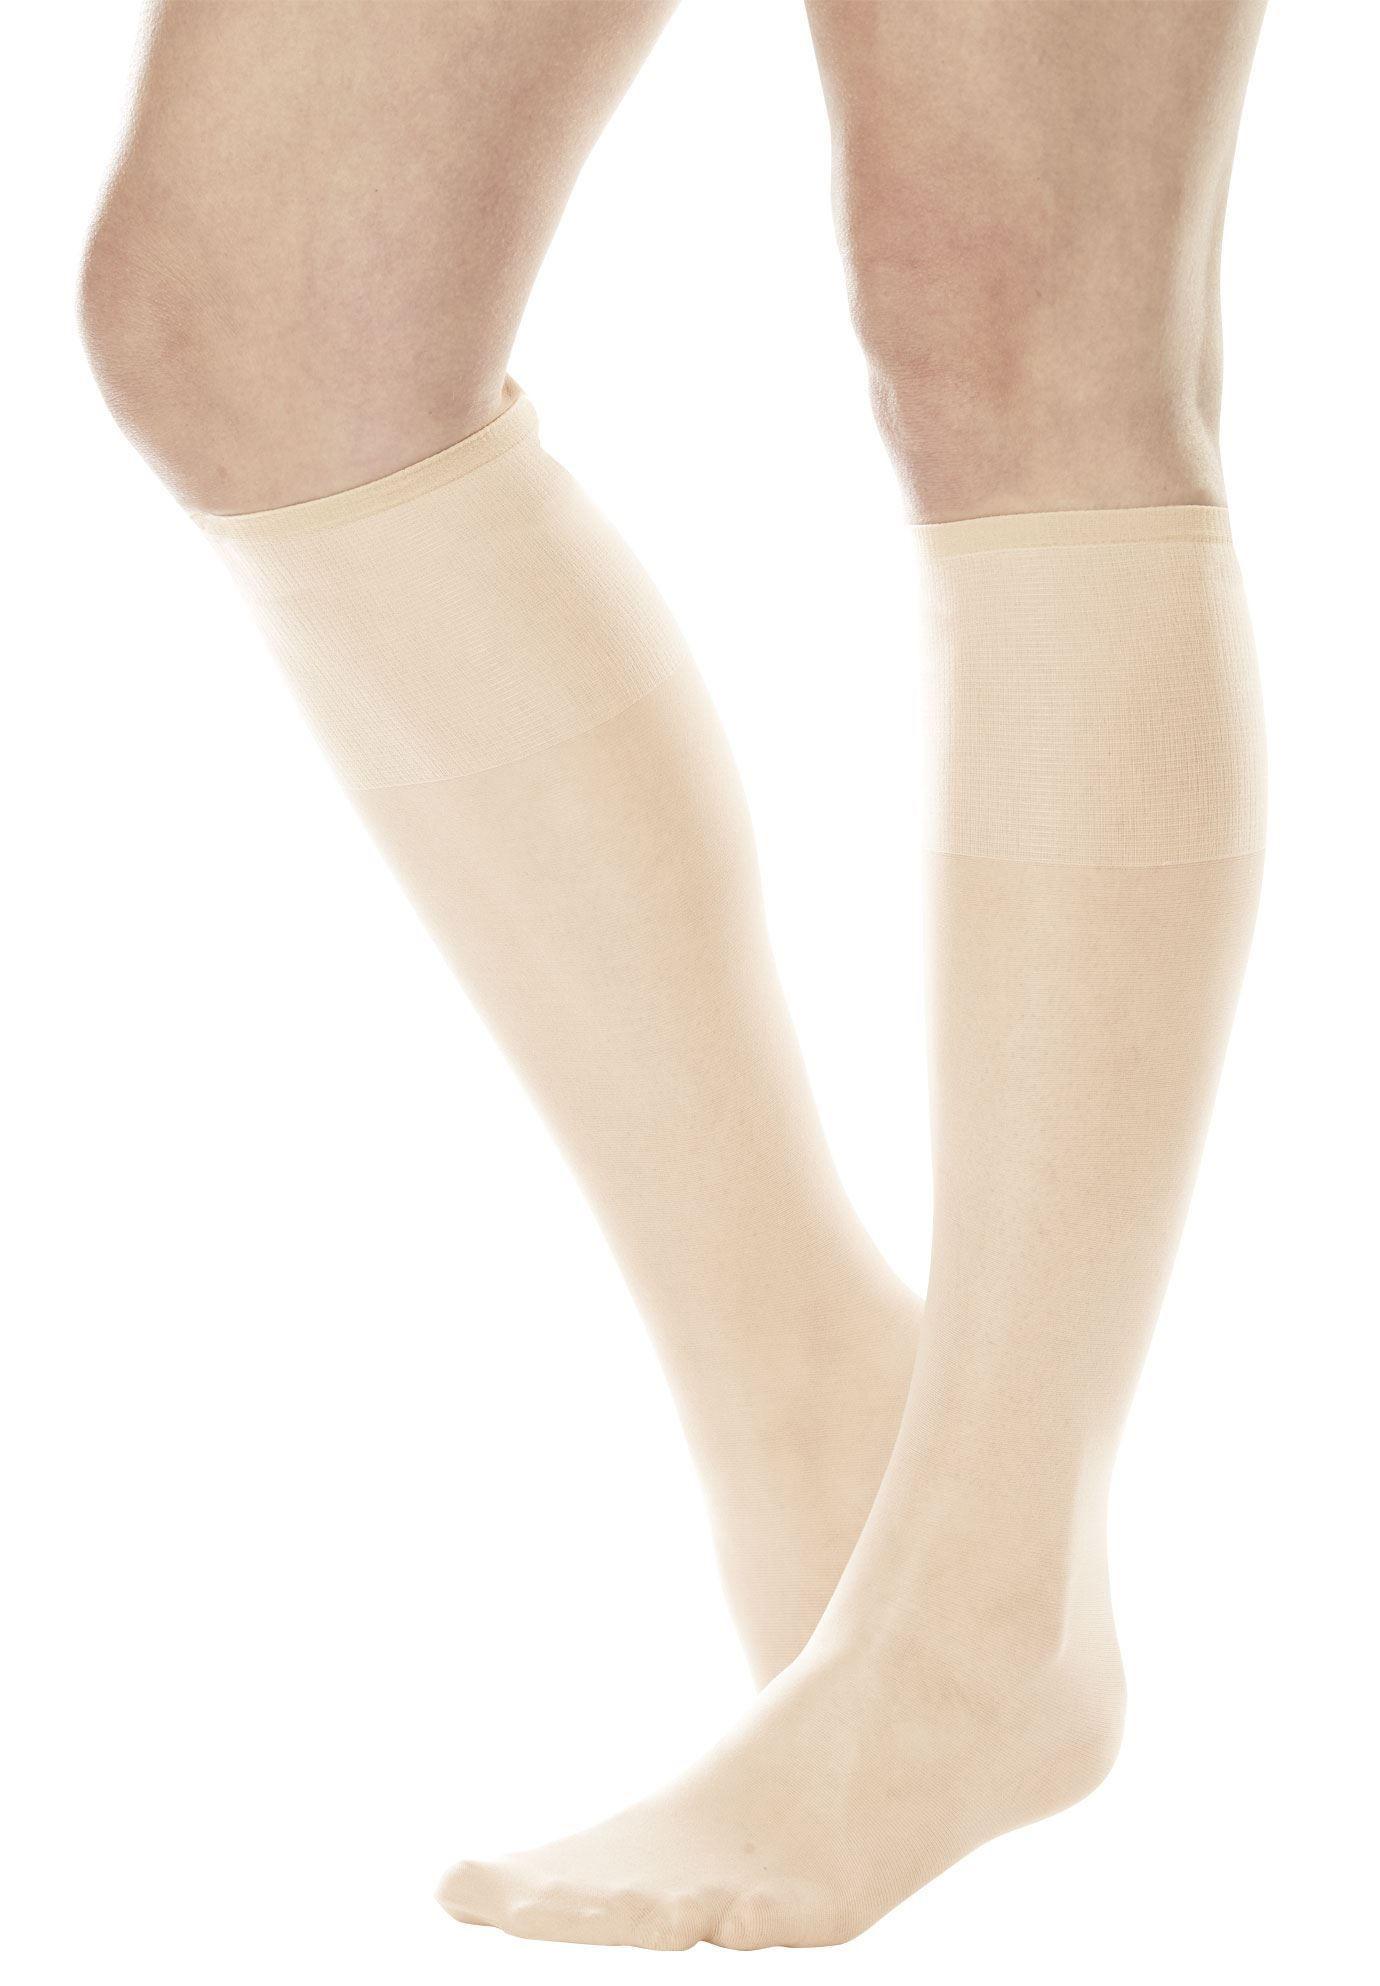 6-pack sheer nylon knee-high stockings by comfort choice - women's